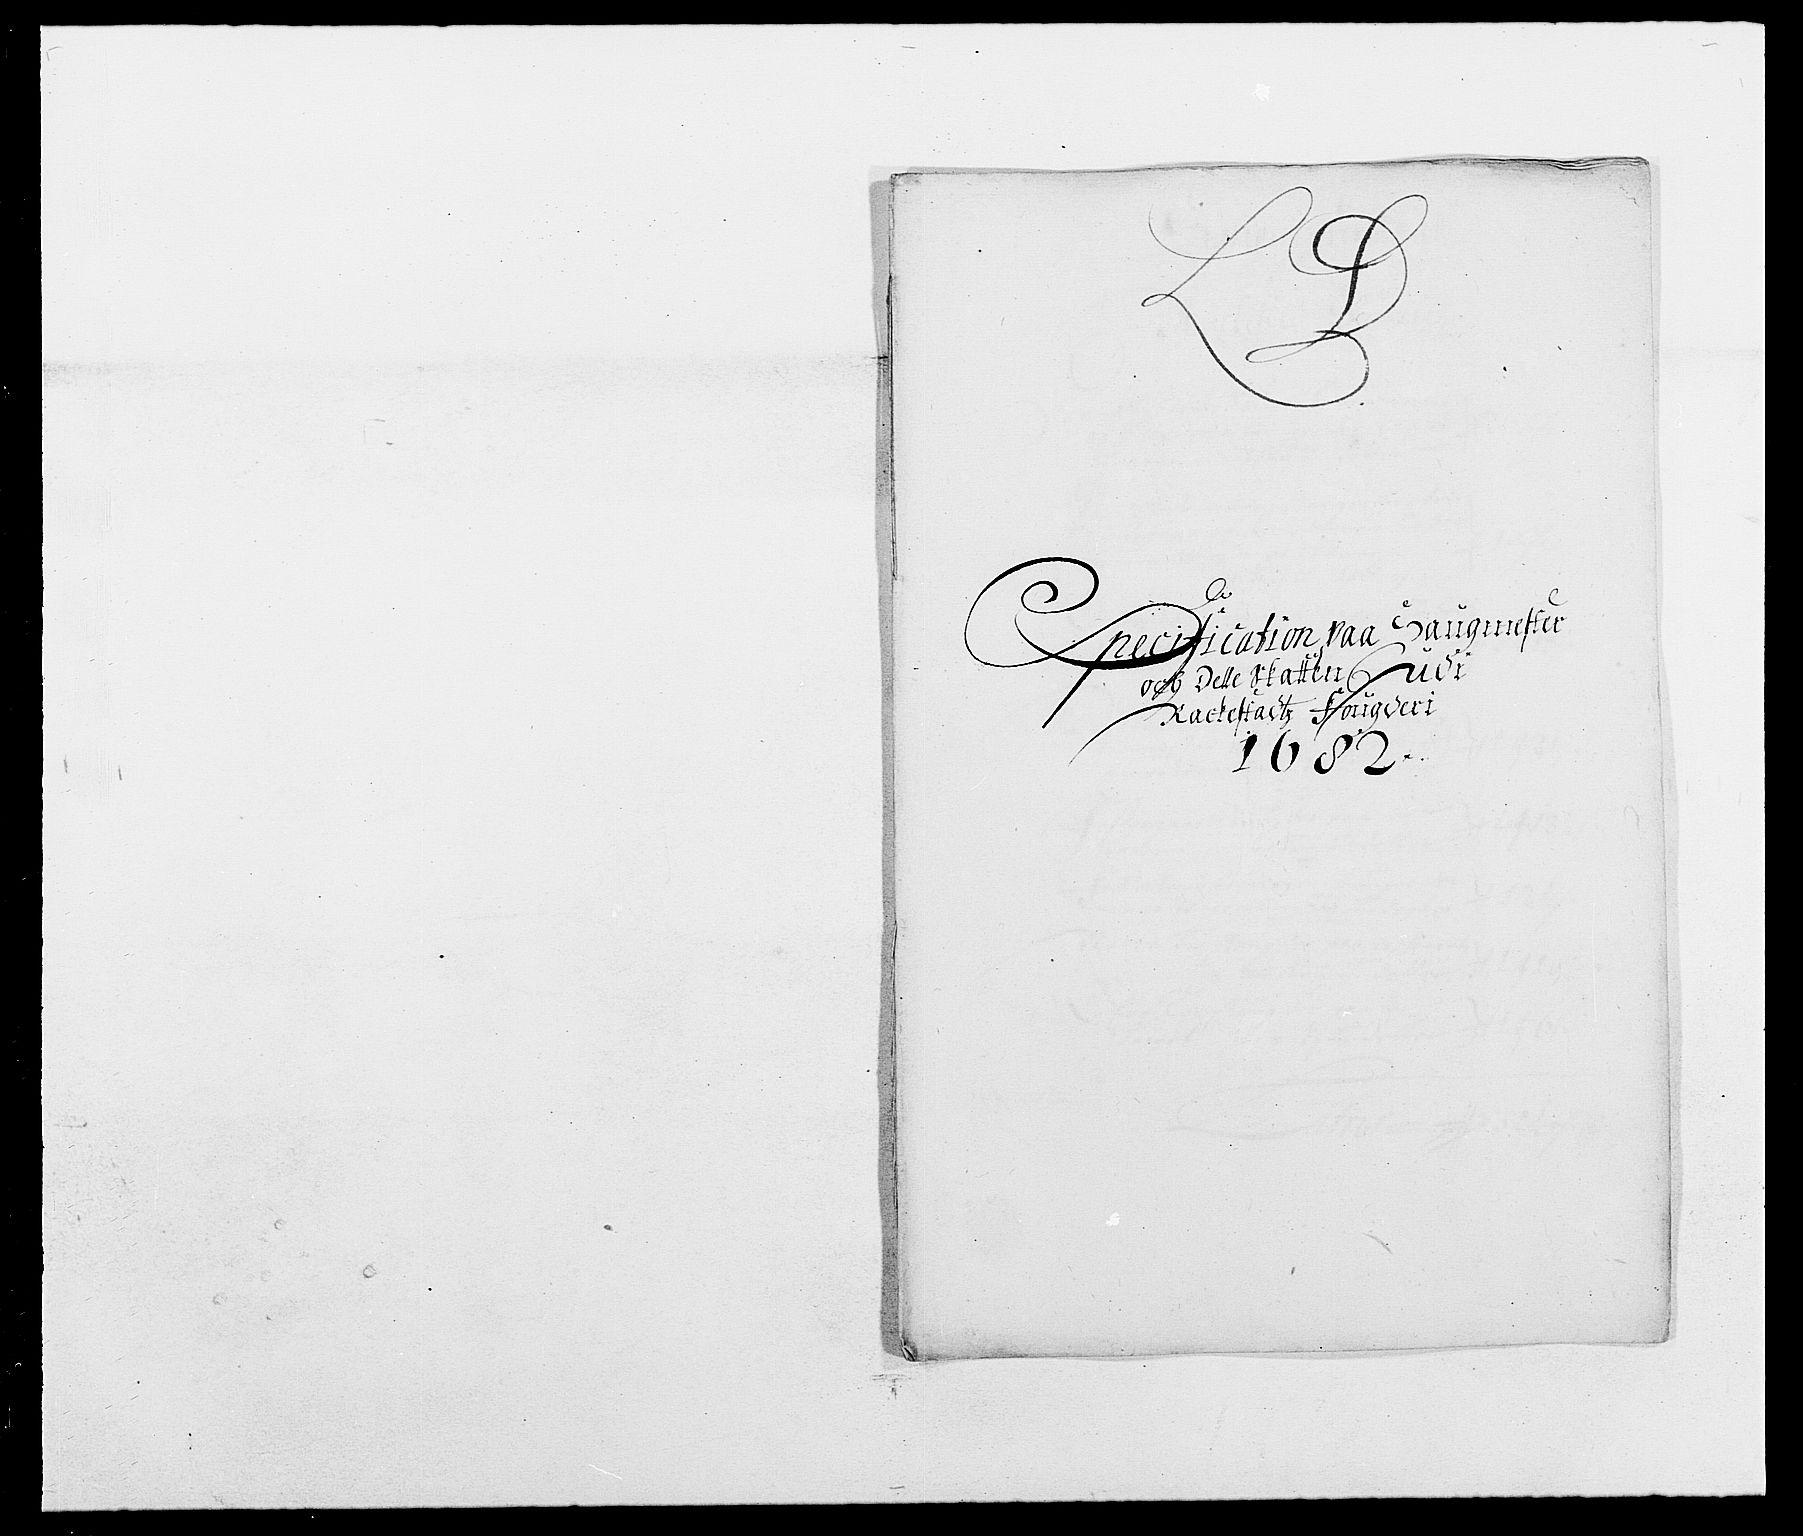 RA, Rentekammeret inntil 1814, Reviderte regnskaper, Fogderegnskap, R05/L0273: Fogderegnskap Rakkestad, 1682, s. 97